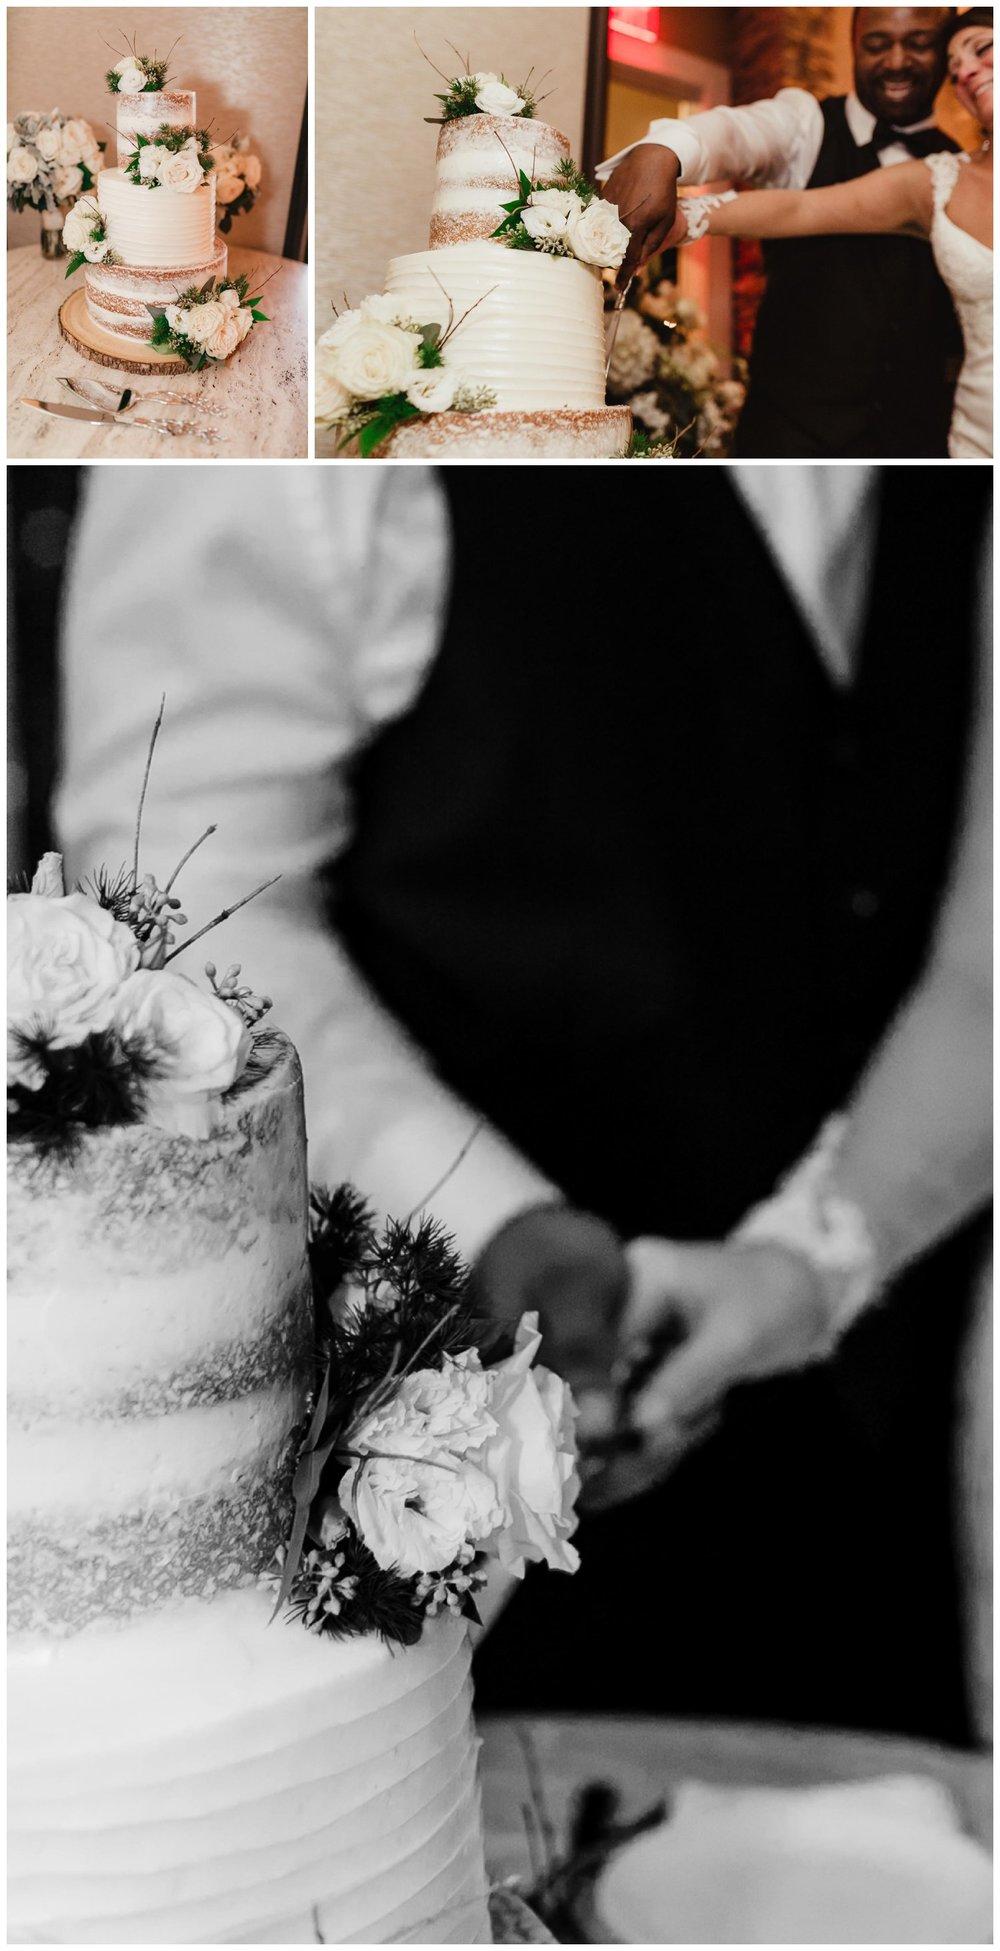 JillandLennon_TheReeds_ShelterHaven_StoneHarbor_NJ_NewJersey__SouthJersey_Wedding_Photographer_MagdalenaStudios_0342.jpg